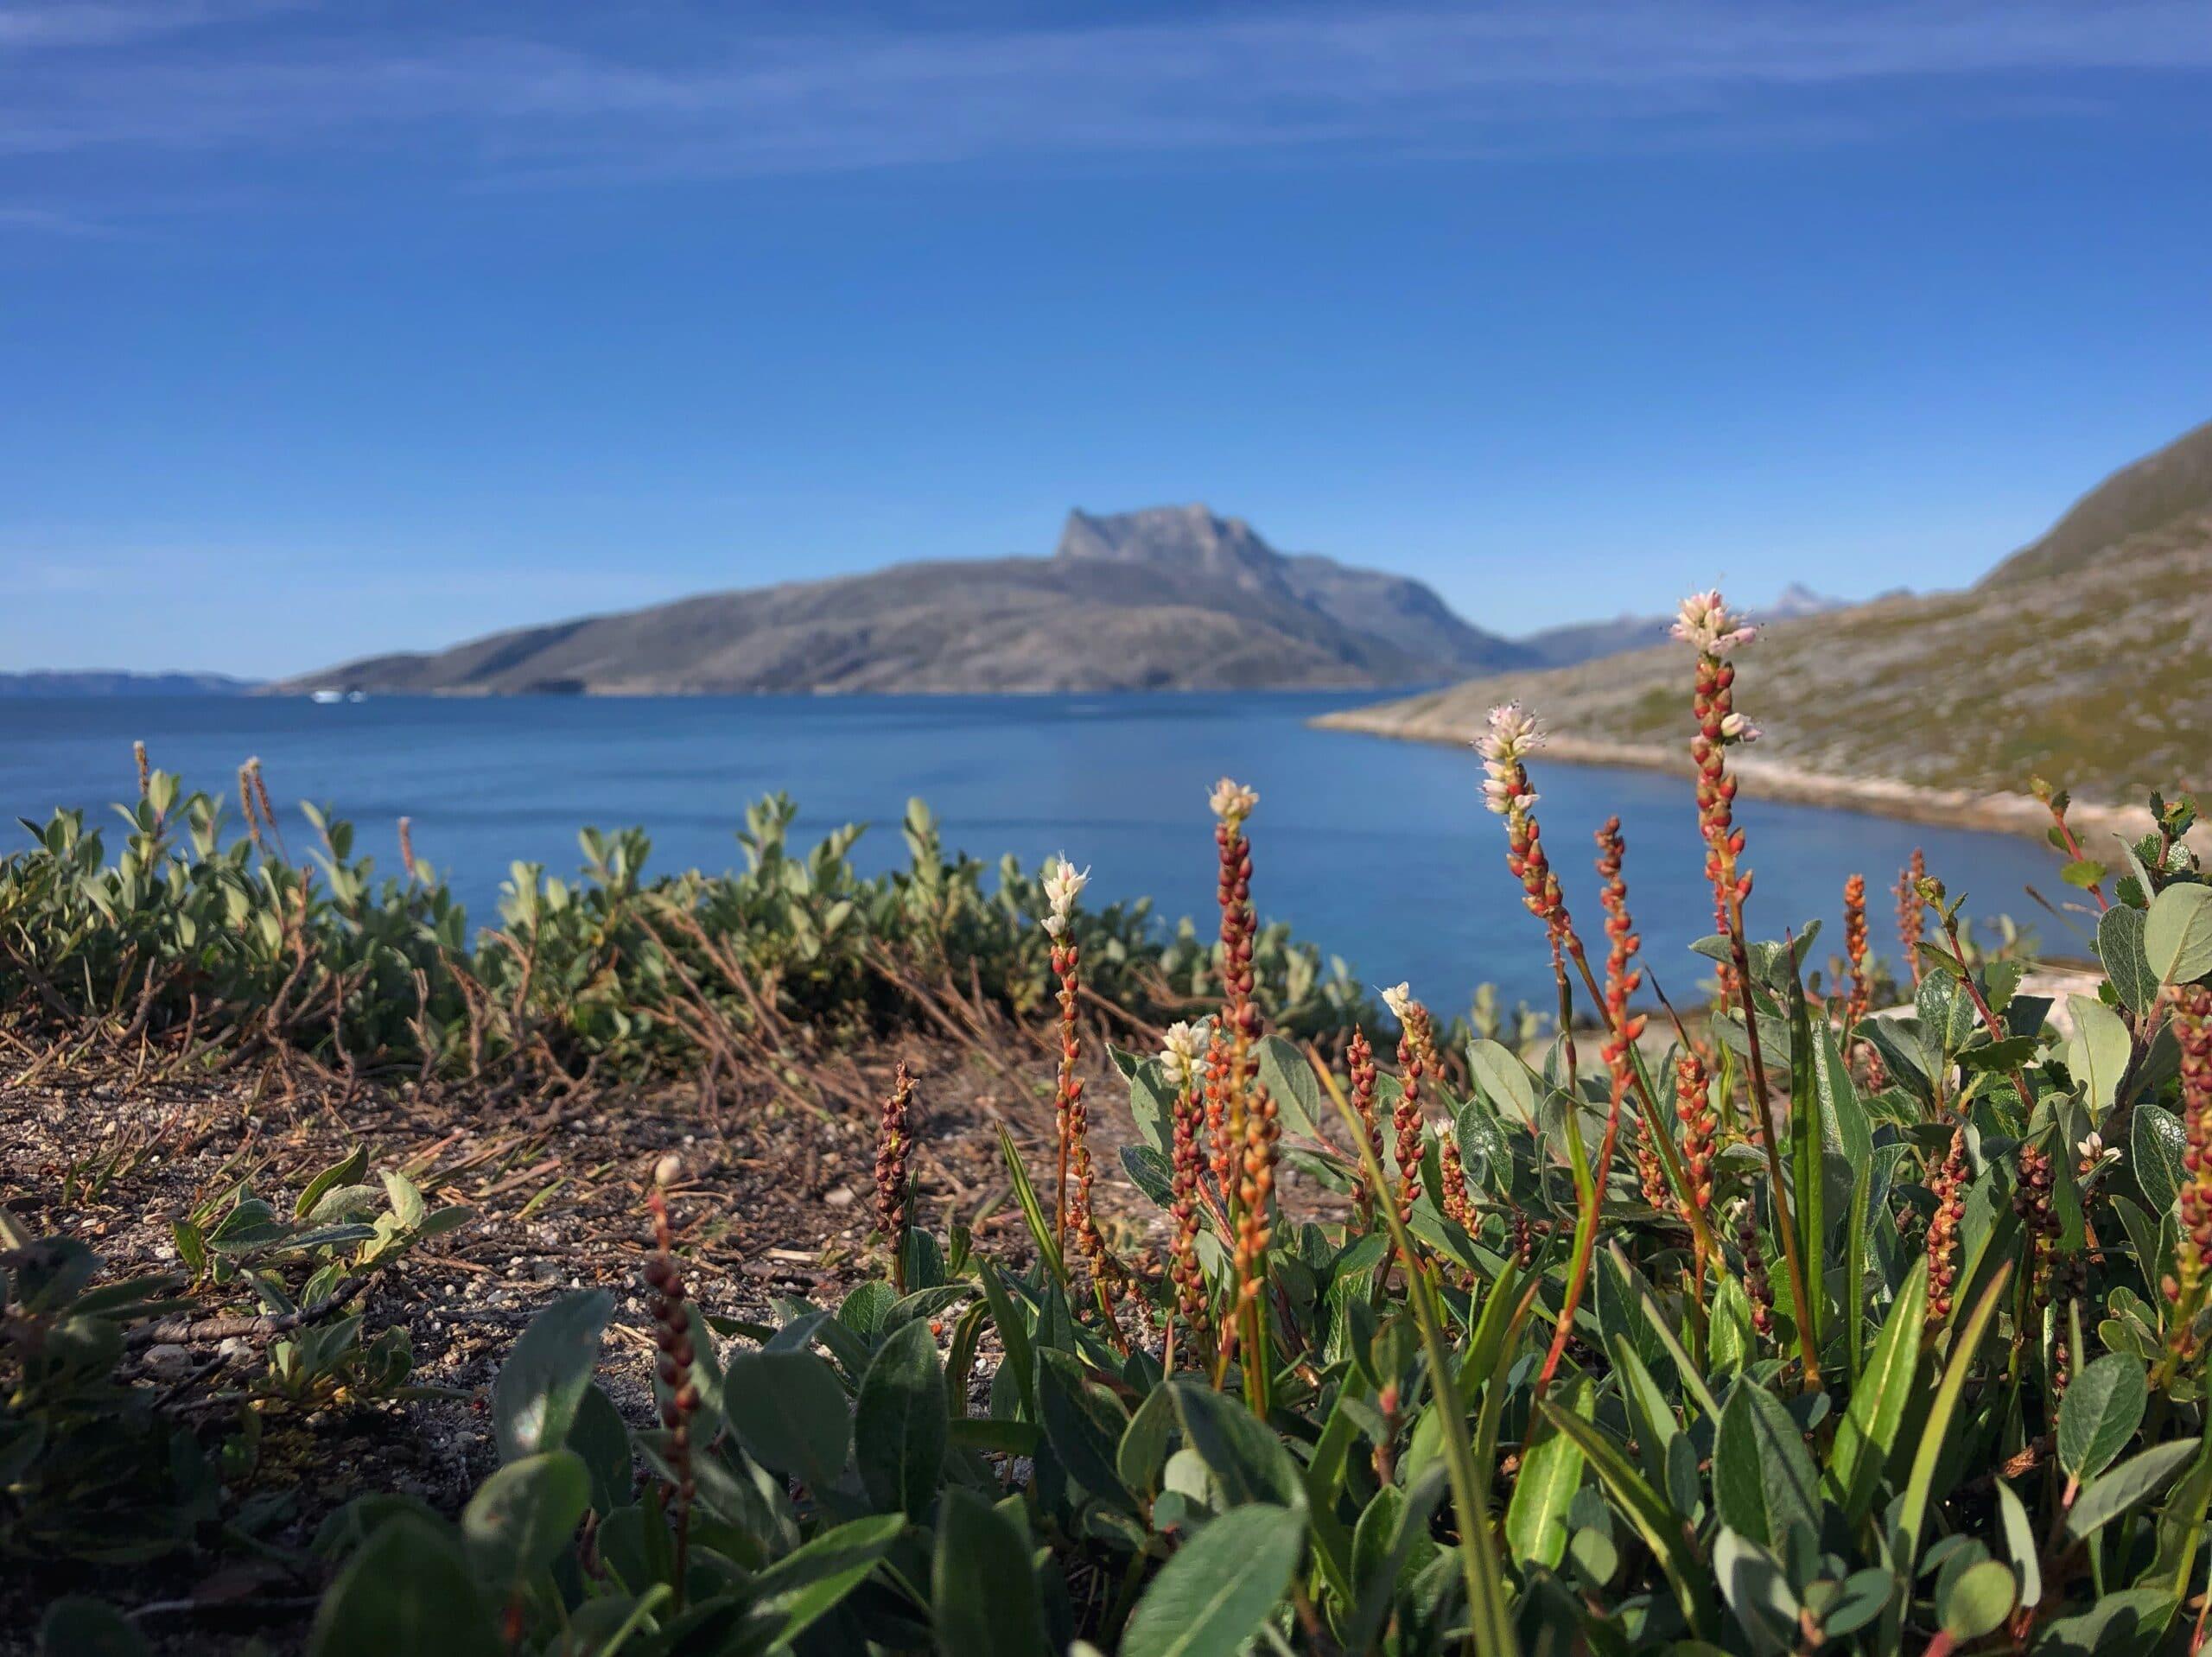 Flowery Nuuk